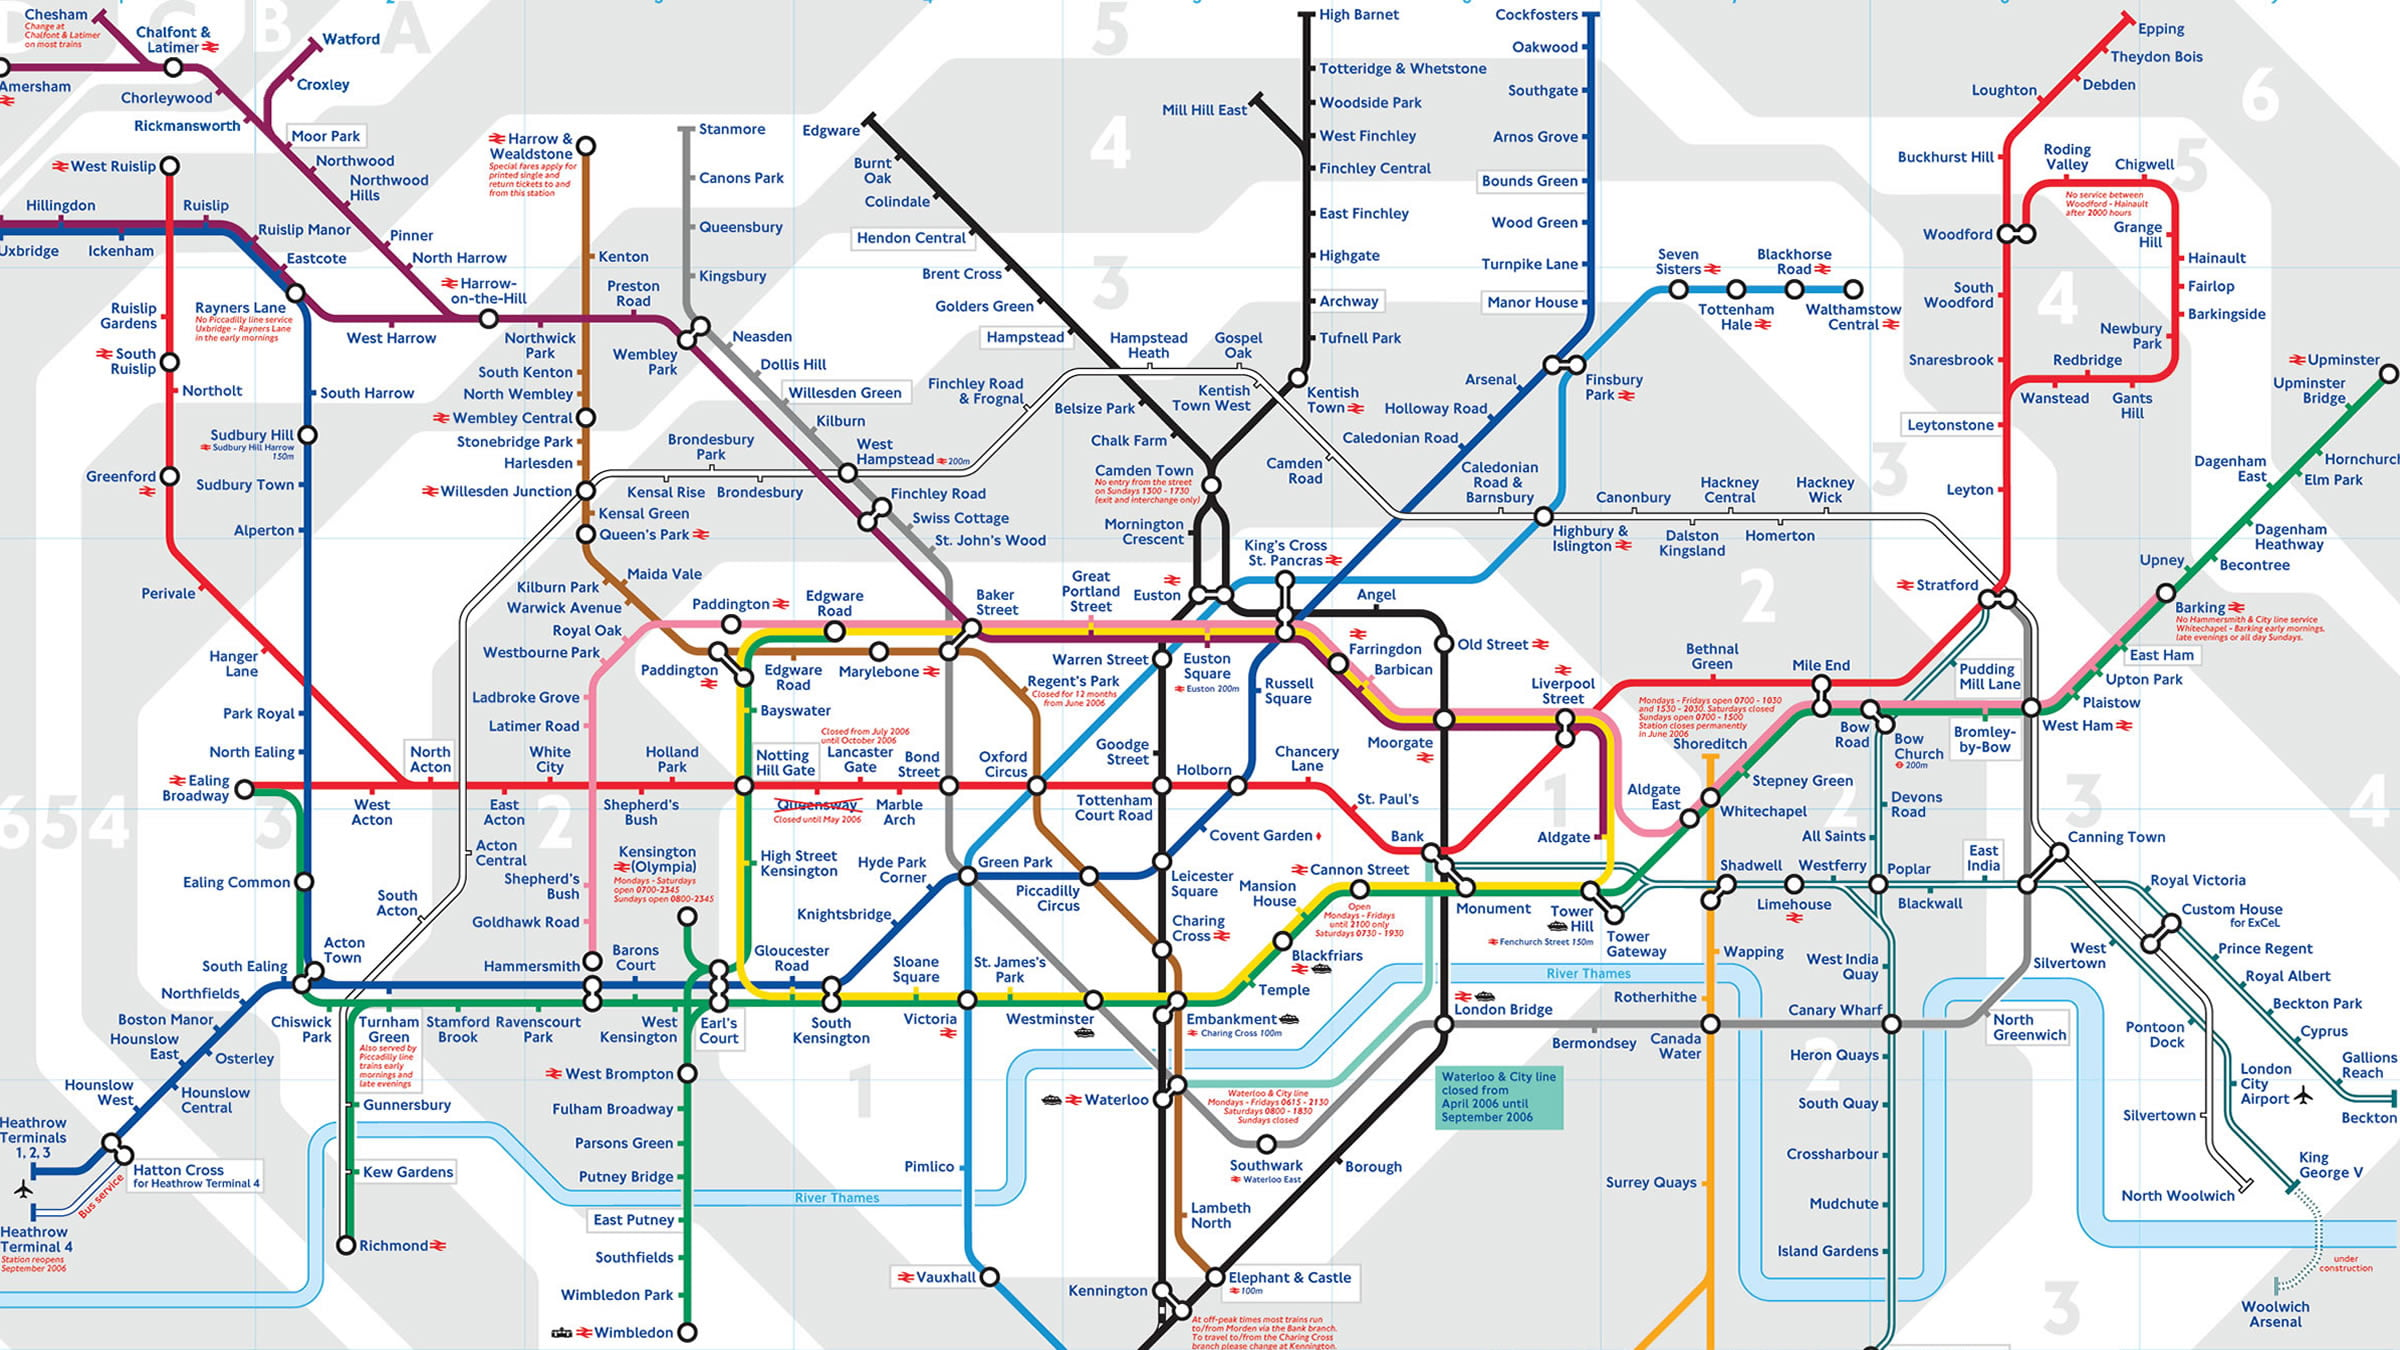 mapa de londres por zonas Mapa de las líneas de metro de Londres con zonas mapa de londres por zonas